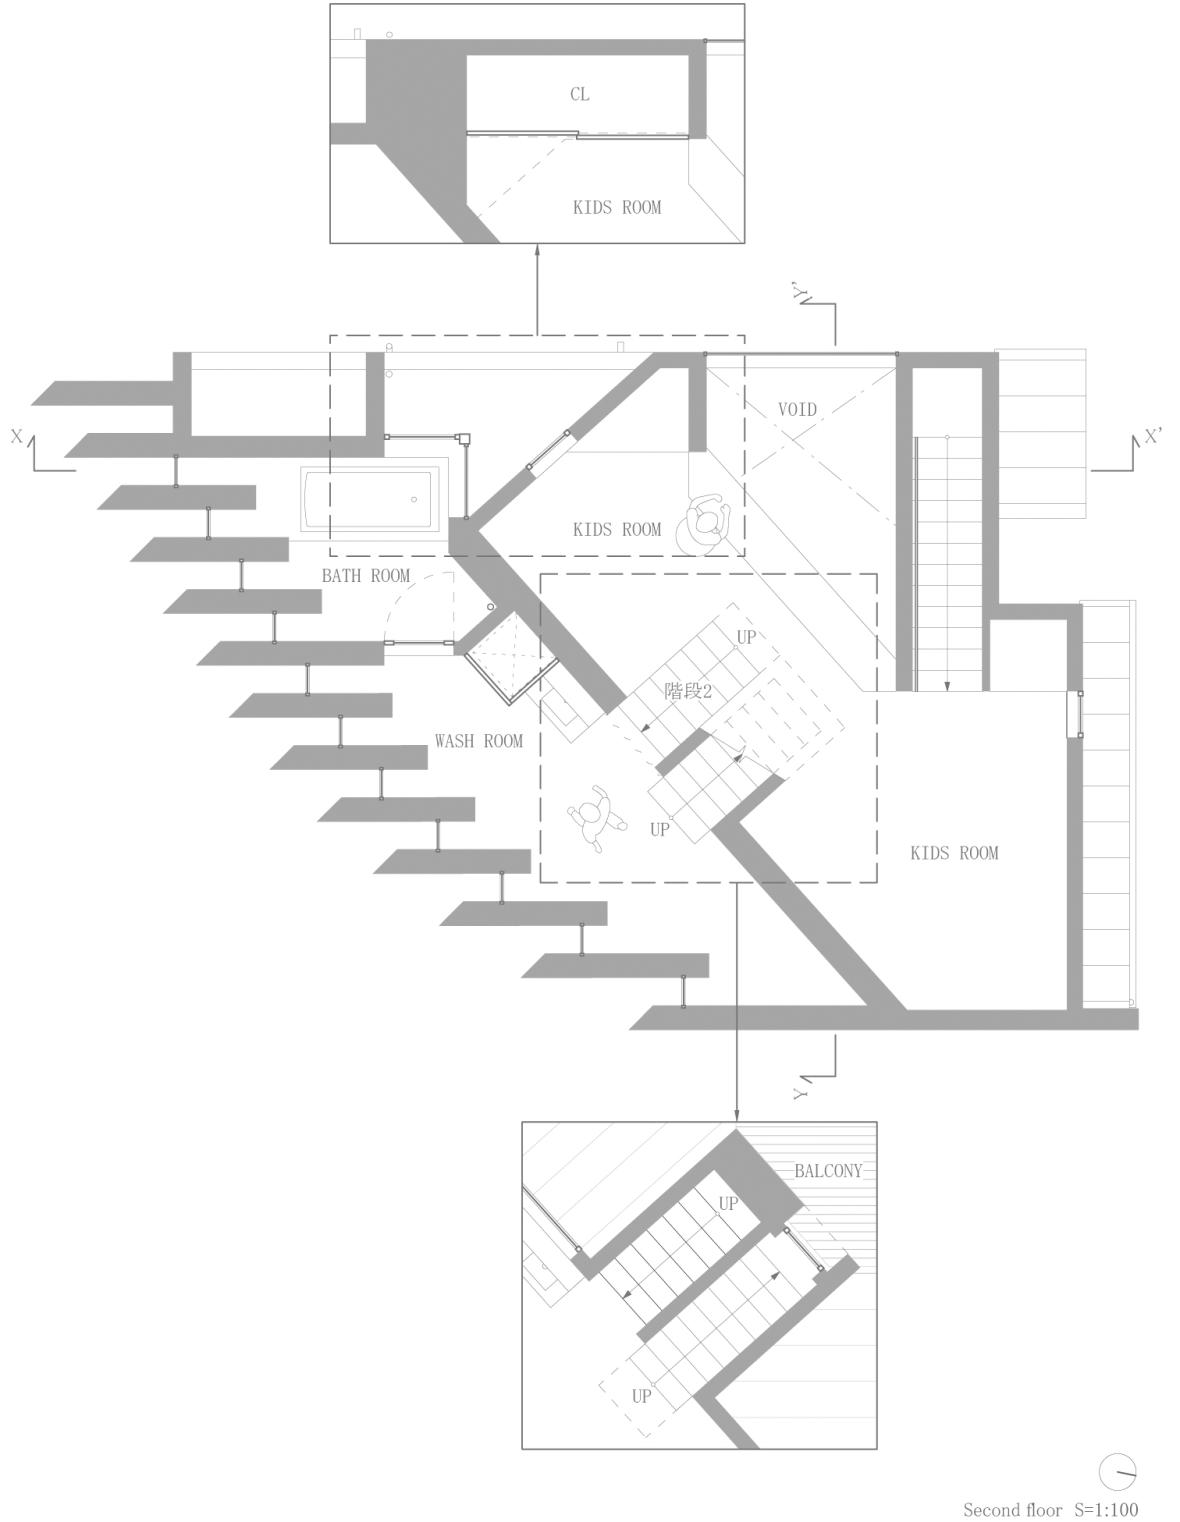 5144ad82b3fc4bb1d800005c_house-in-muko-fujiwarramuro-architects_second